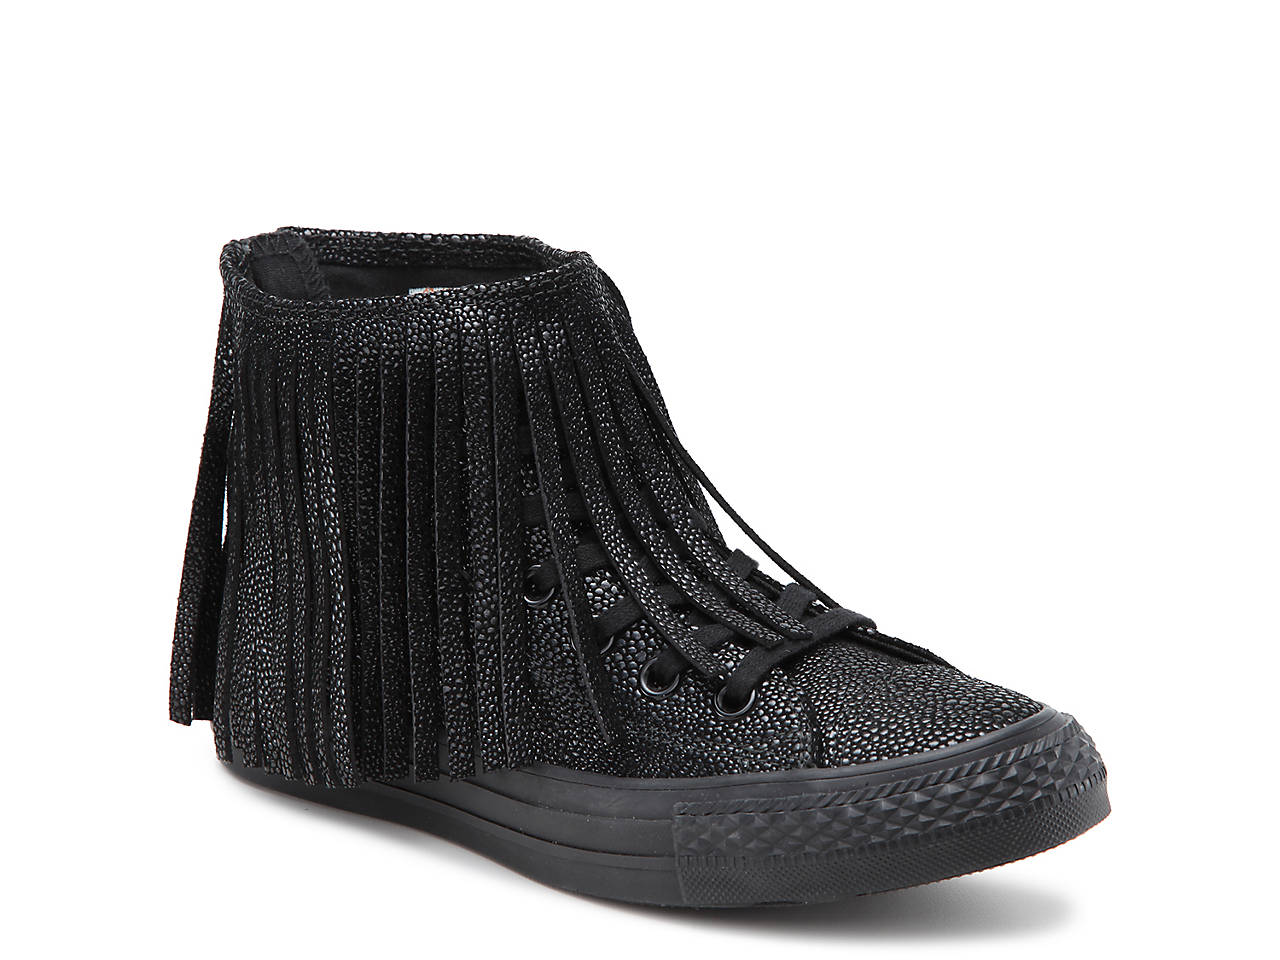 e260b8ddb7e2 Converse Chuck Taylor All Star Fringe High-Top Sneaker - Women s ...